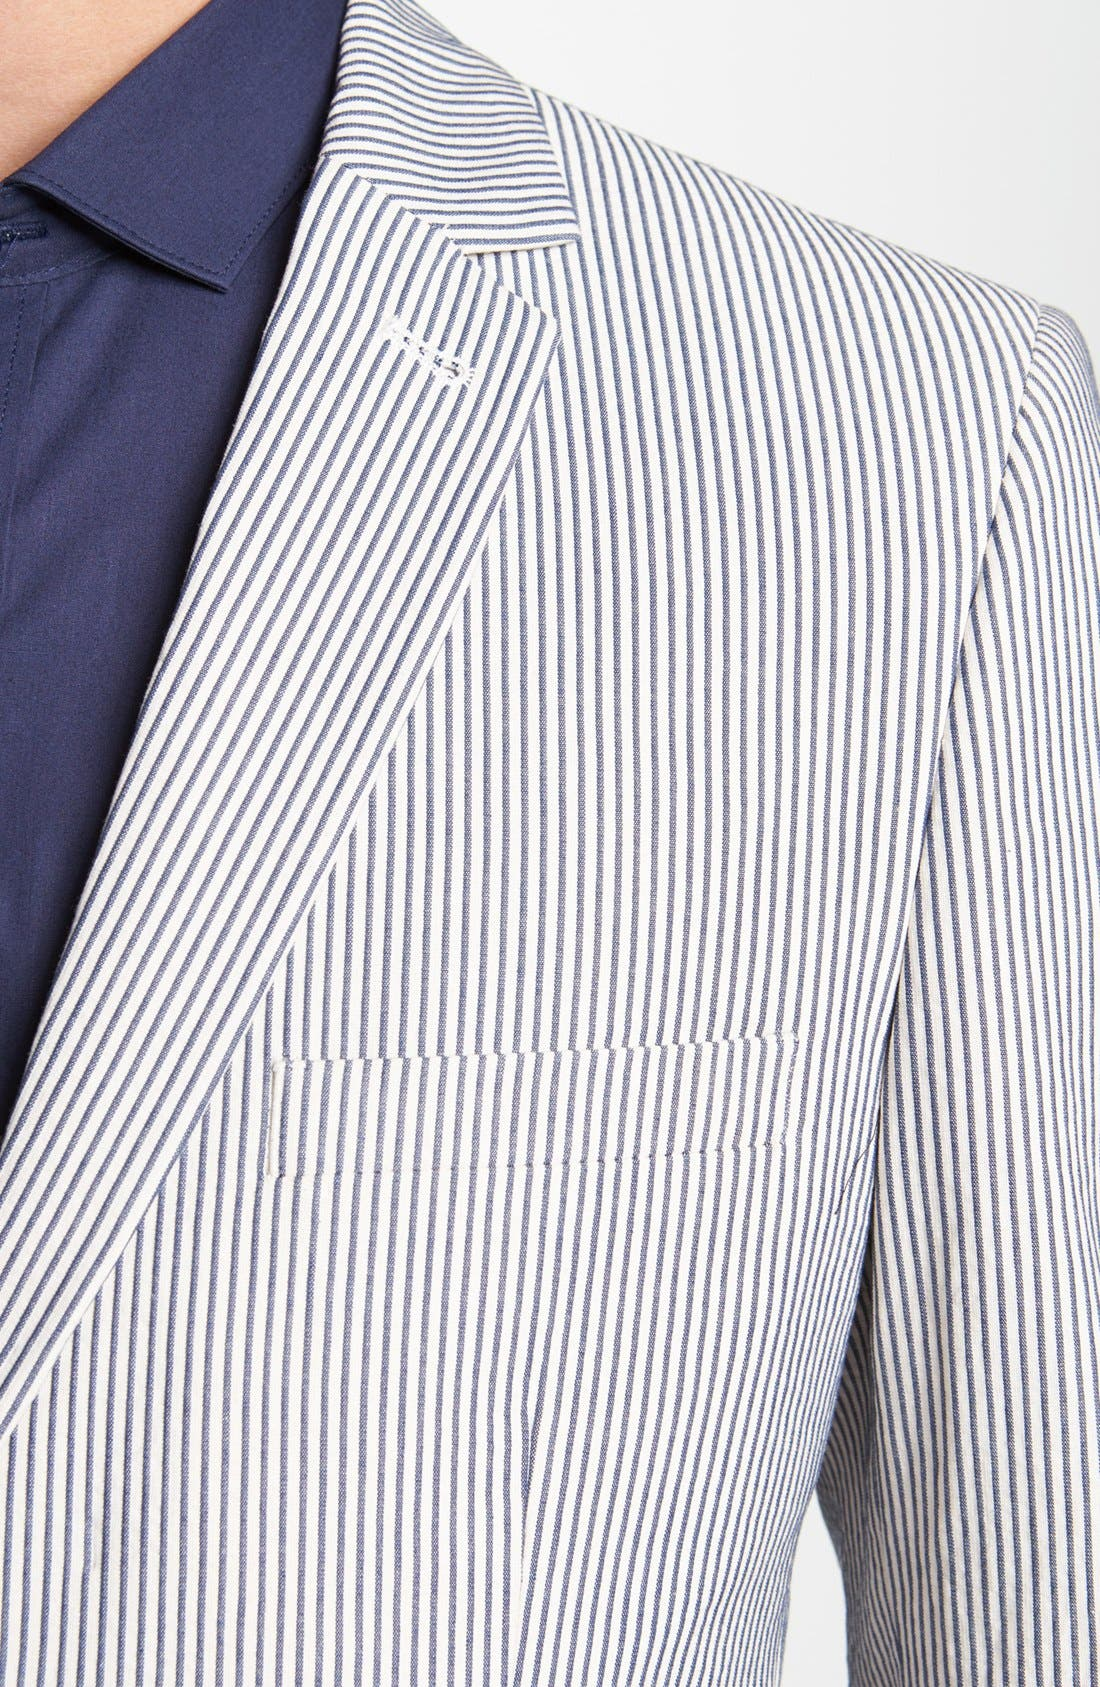 Alternate Image 3  - Topman Skinny Seersucker Blazer